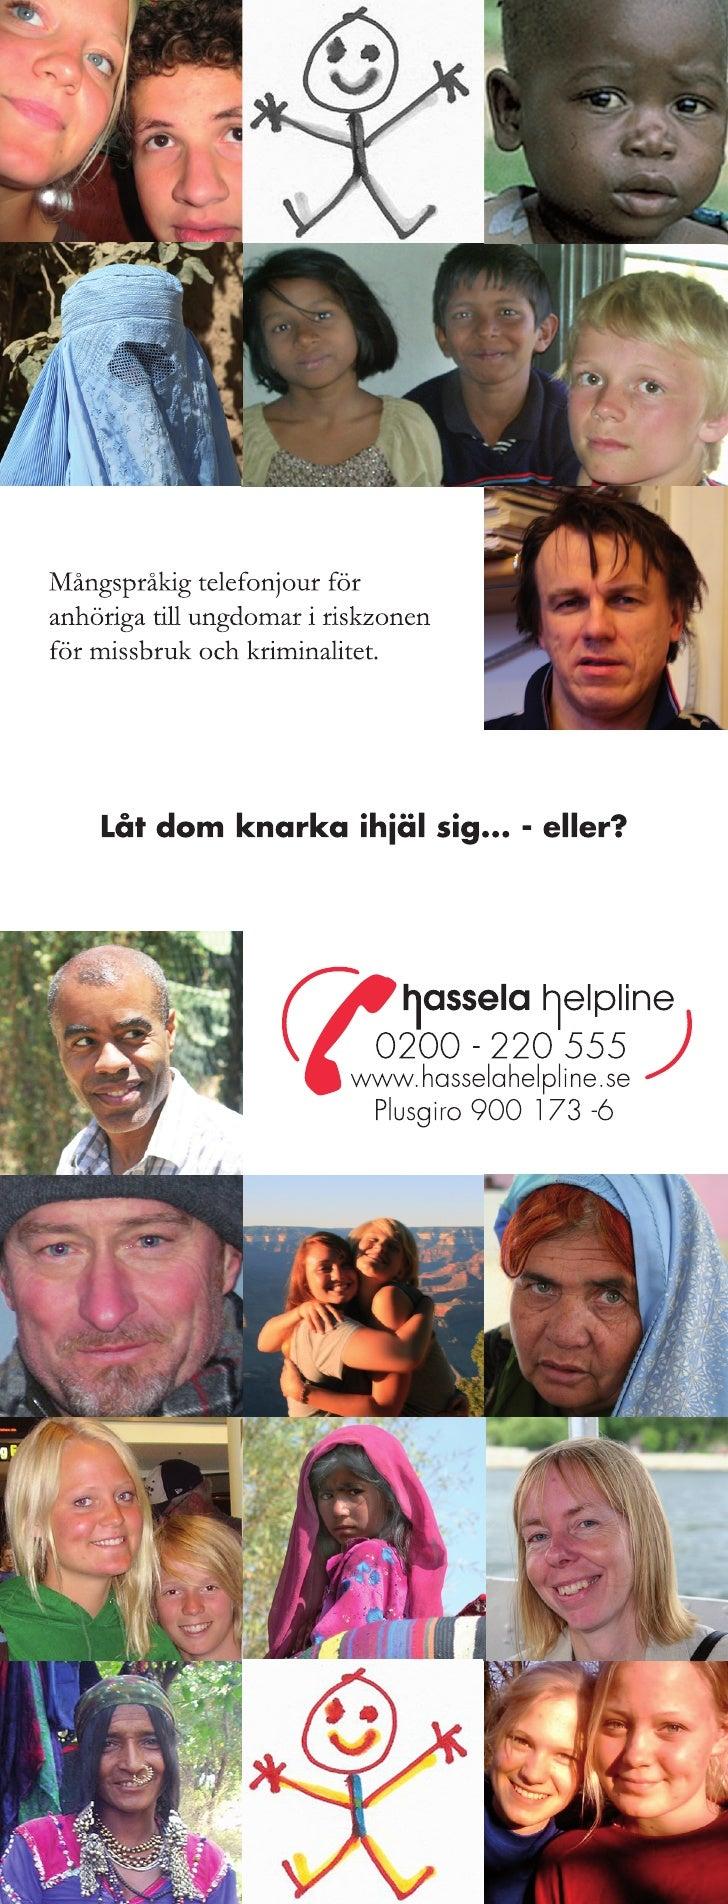 Hassela_Helpline-pluggannons_104x272.pdf